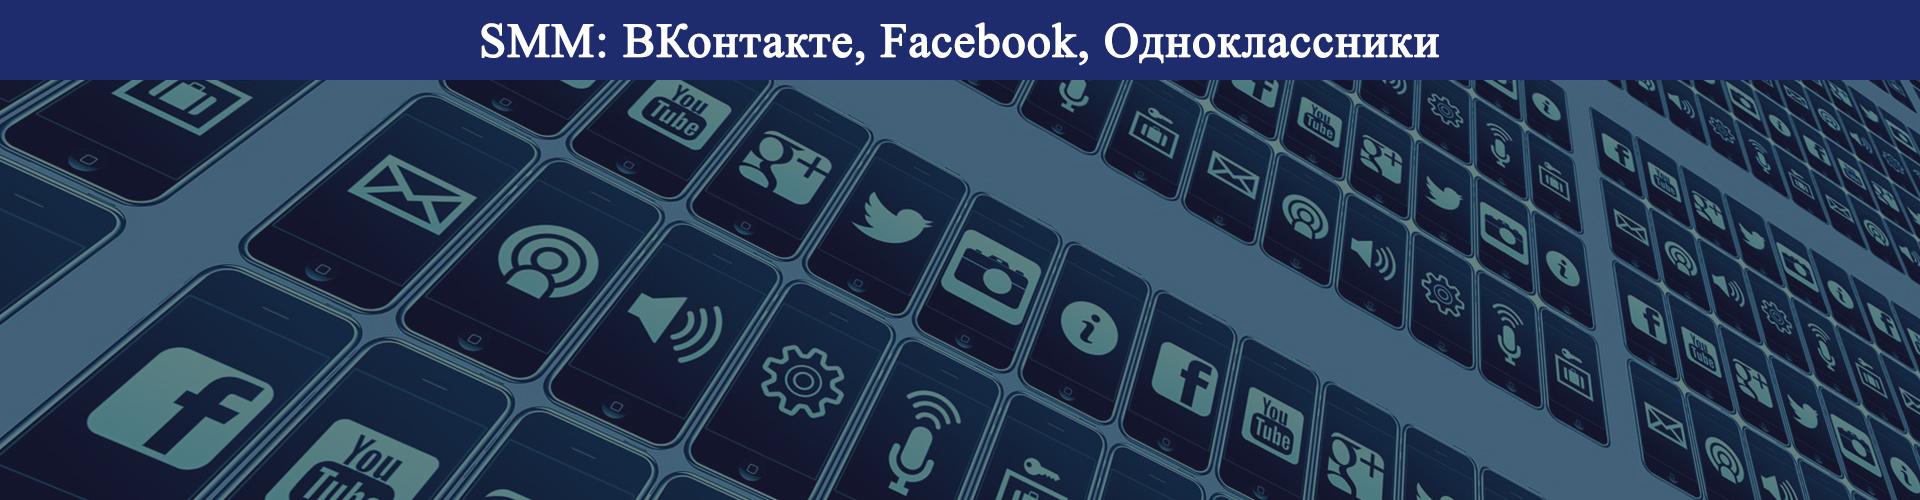 smm vk, facebook, ok